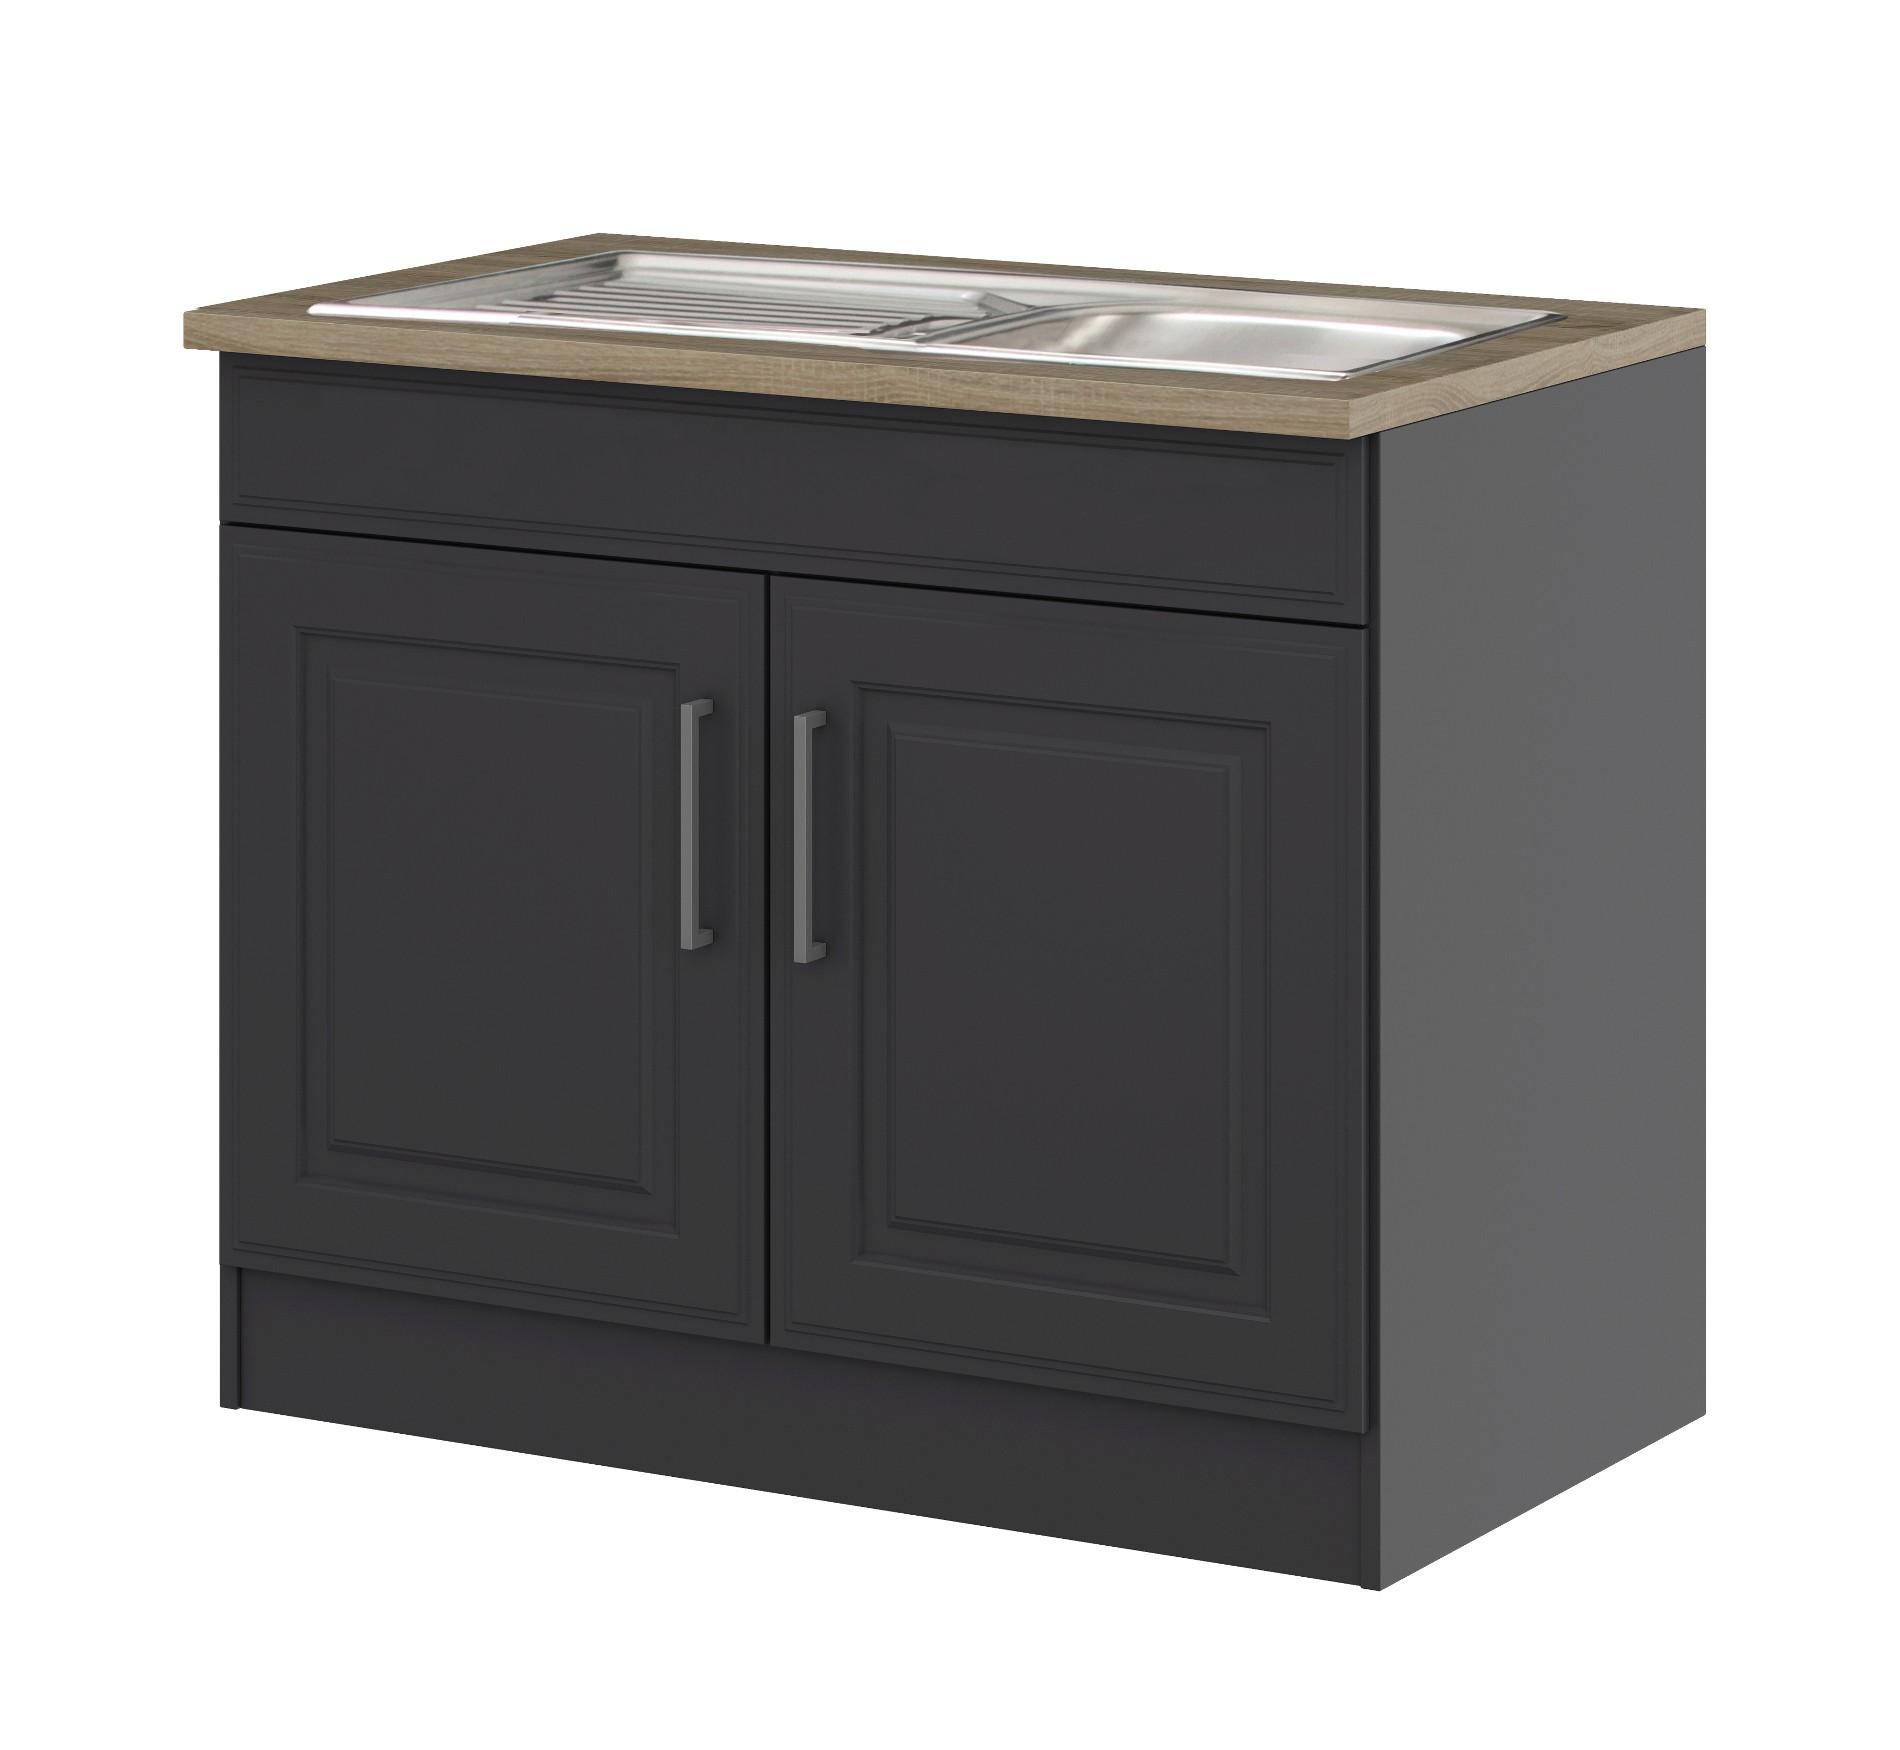 k chen sp lenschrank k ln 2 t rig 100 cm breit grau. Black Bedroom Furniture Sets. Home Design Ideas